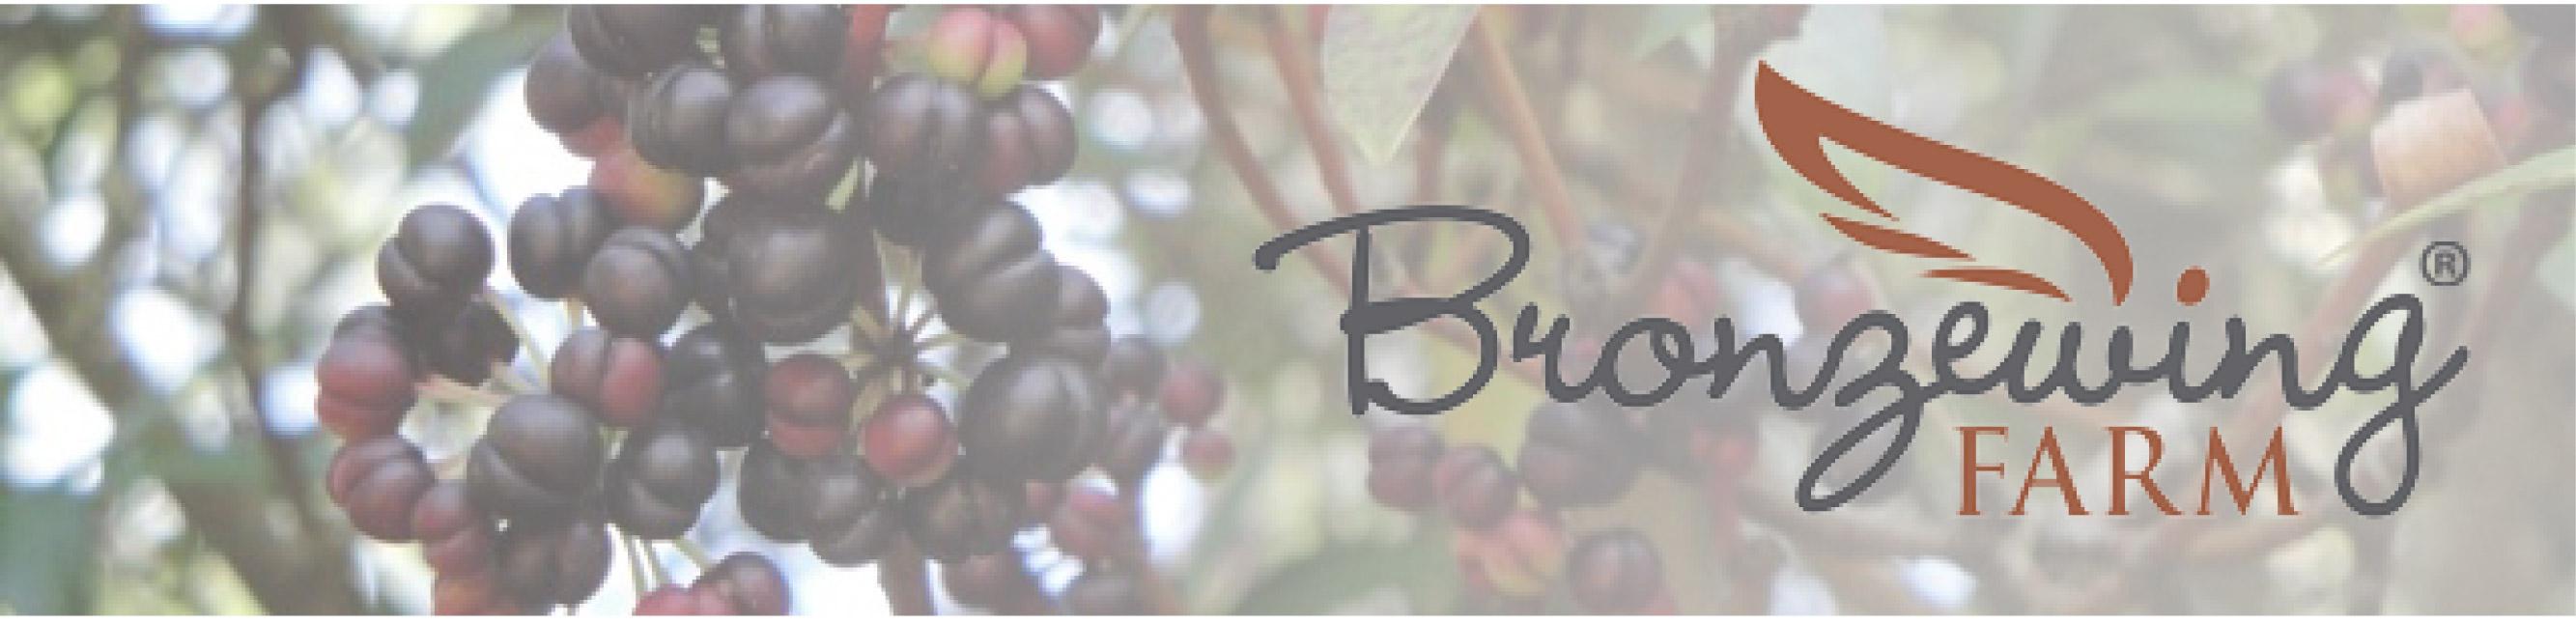 Bronzewing Farm Tasmanan Pepperberries